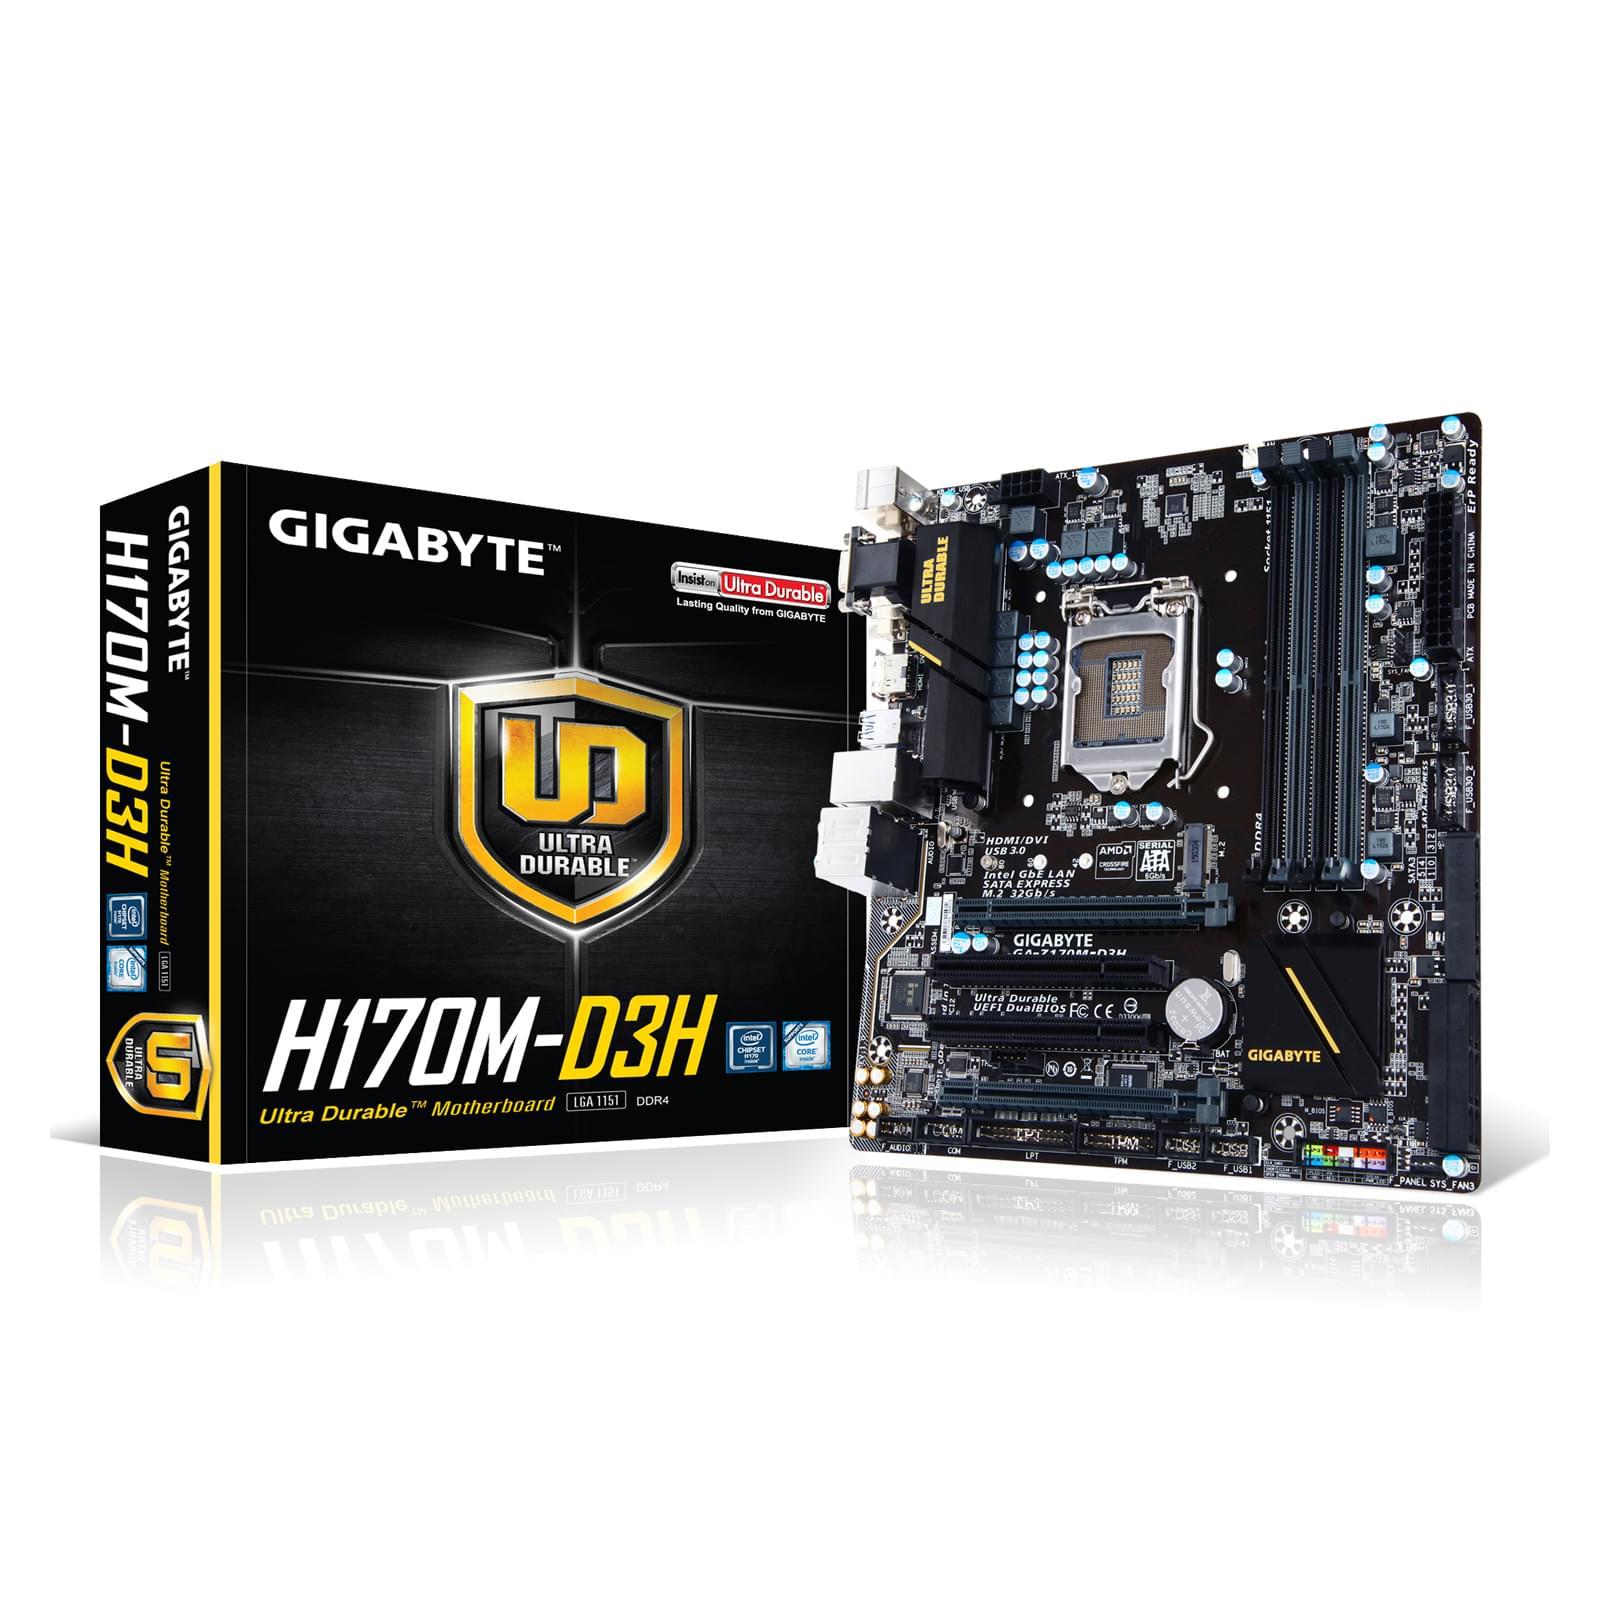 Gigabyte GA-H170M-D3H (GA-H170M-D3H) - Achat / Vente Carte Mère sur Cybertek.fr - 0